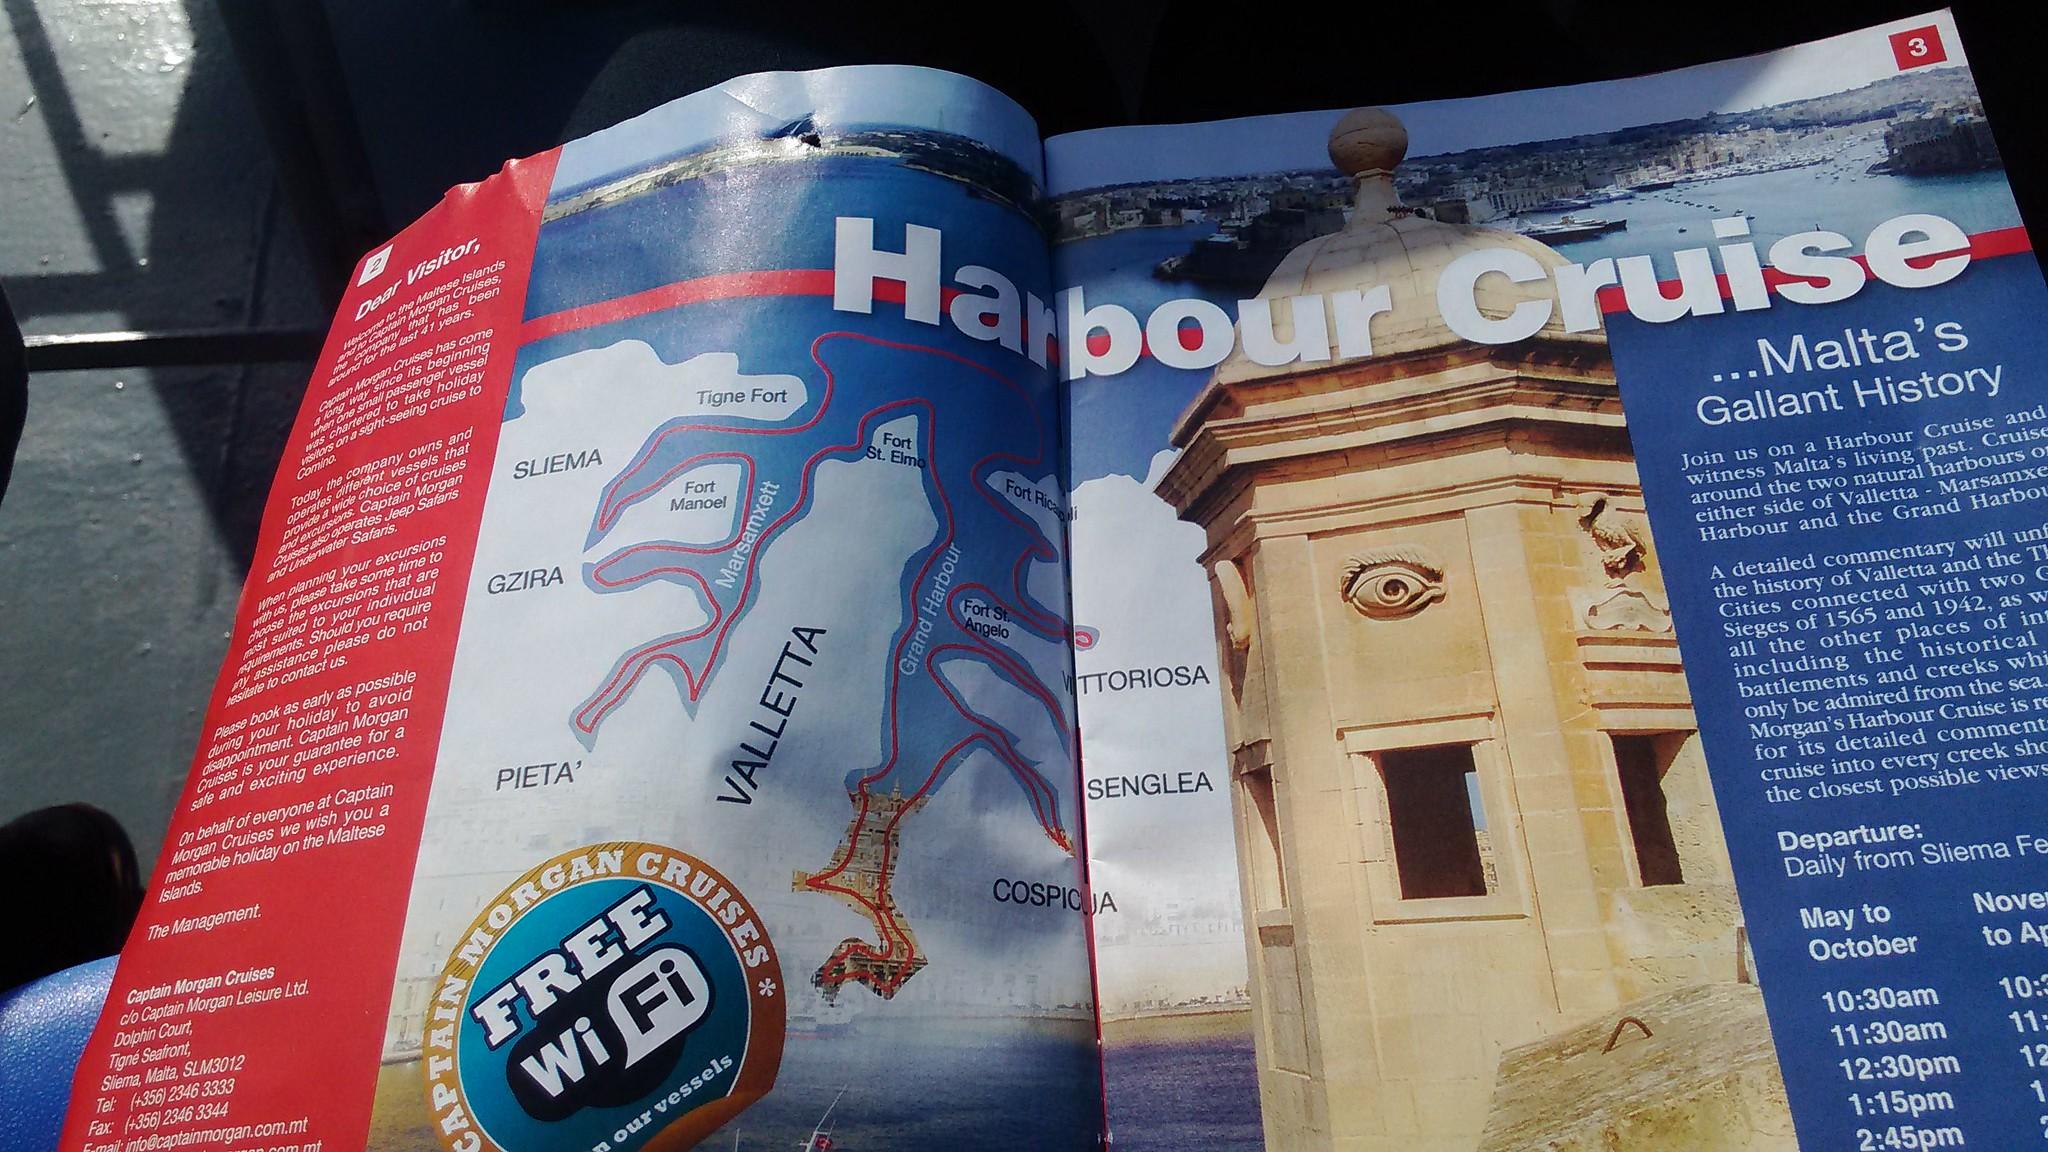 Tour Harbour Cruise con partenza da Sliema Ferries